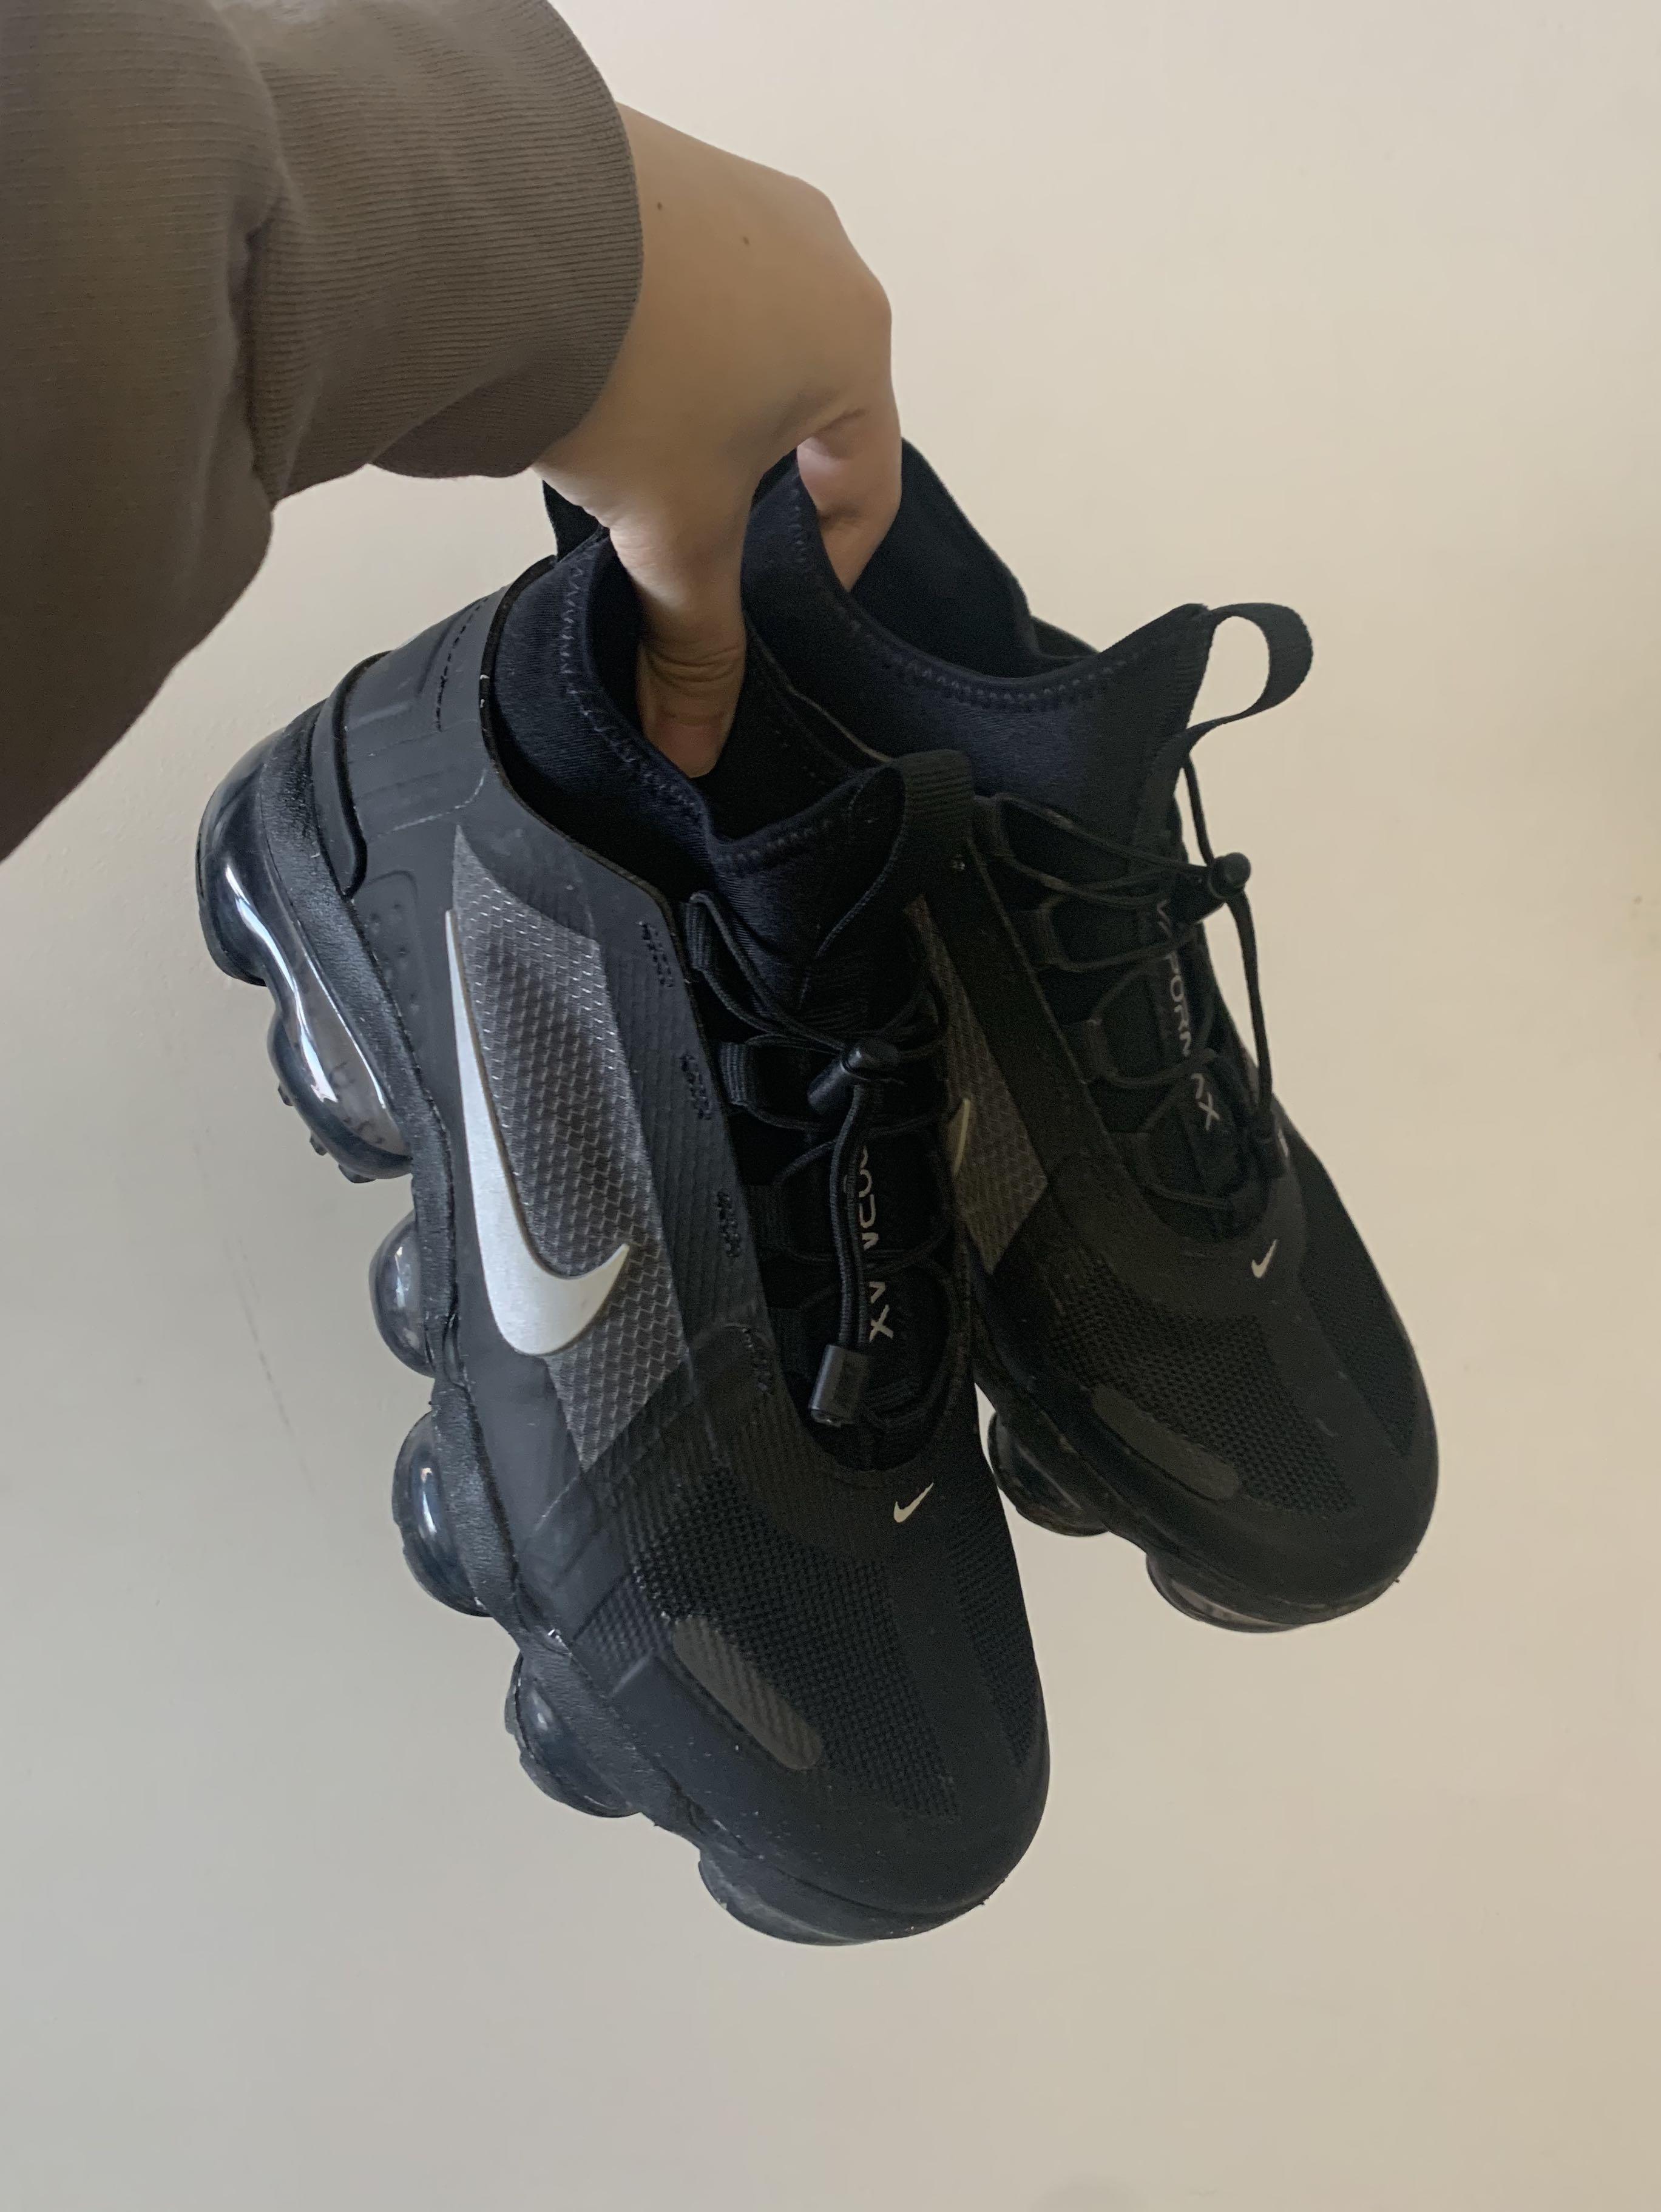 Black Nike Vapourmax Utility 2019